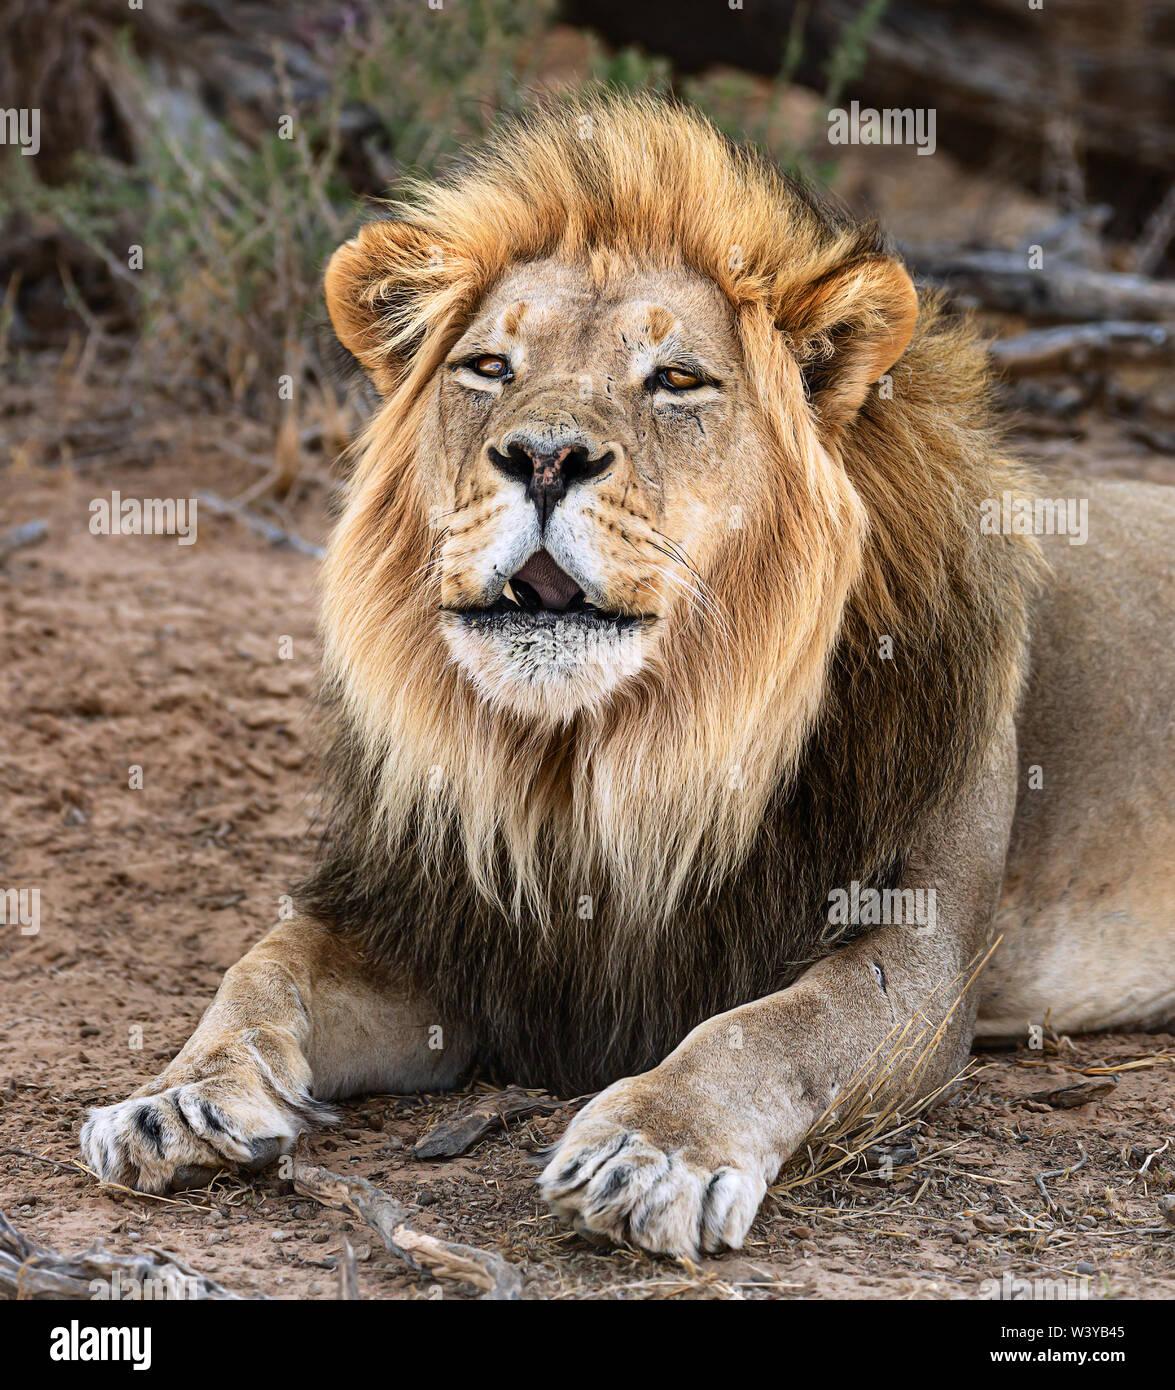 Roaring Lion Head Stock Photos & Roaring Lion Head Stock